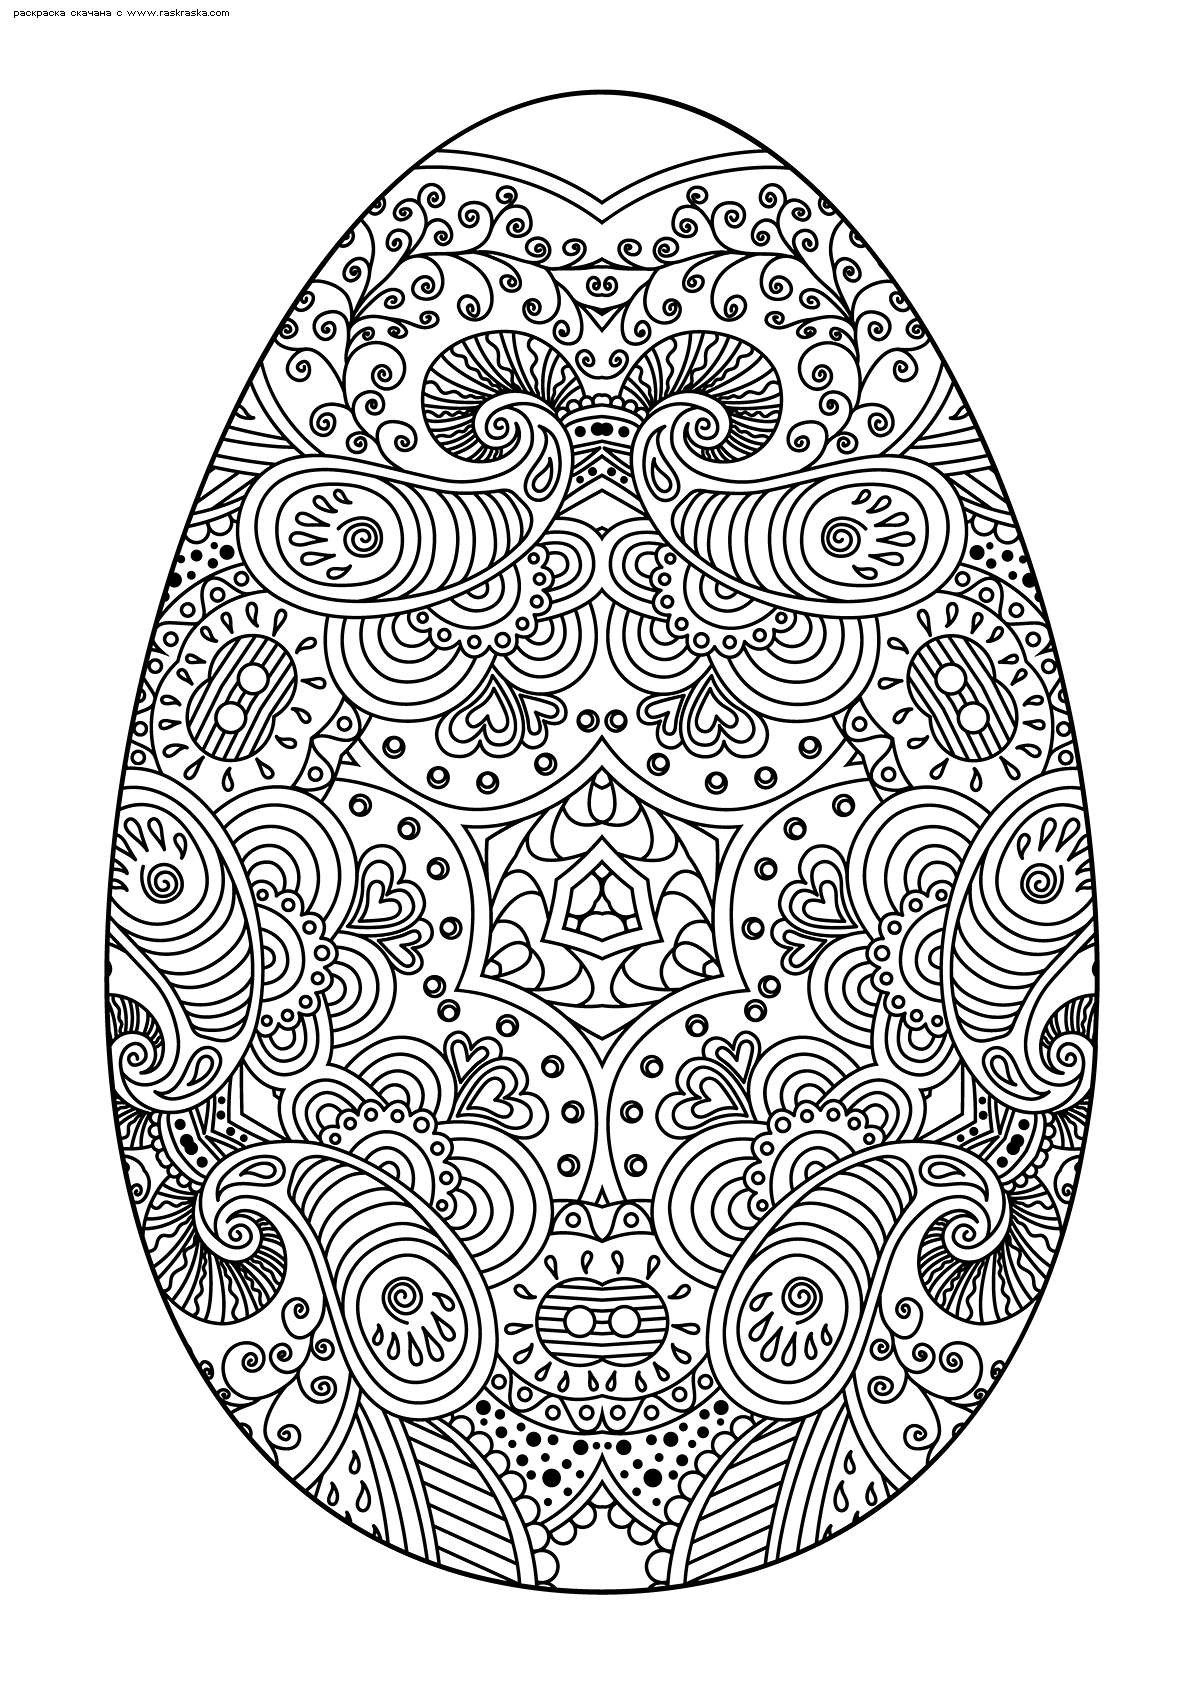 Раскраска Писанка. Раскраска яйцо, Пасха, антистресс